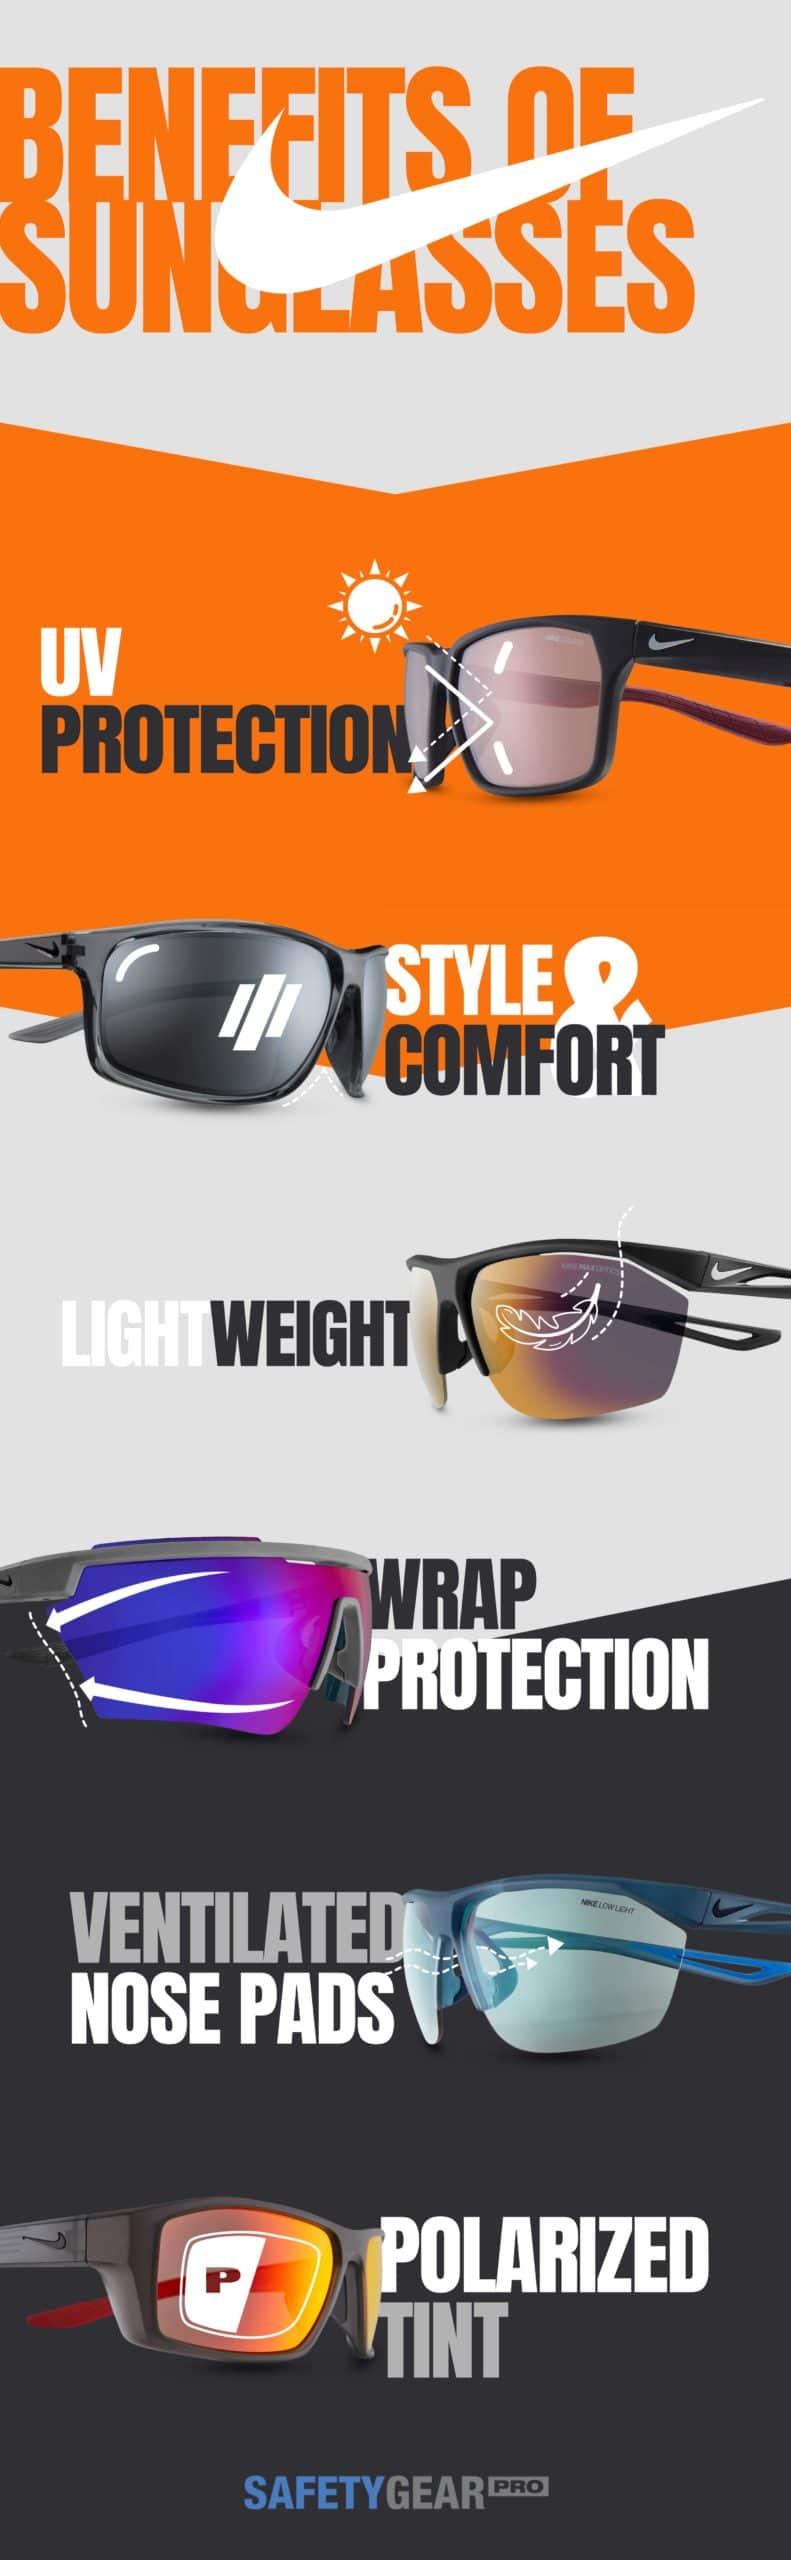 Nuclear Perversión móvil  Benefits of Nike Glasses | Safety Gear Pro